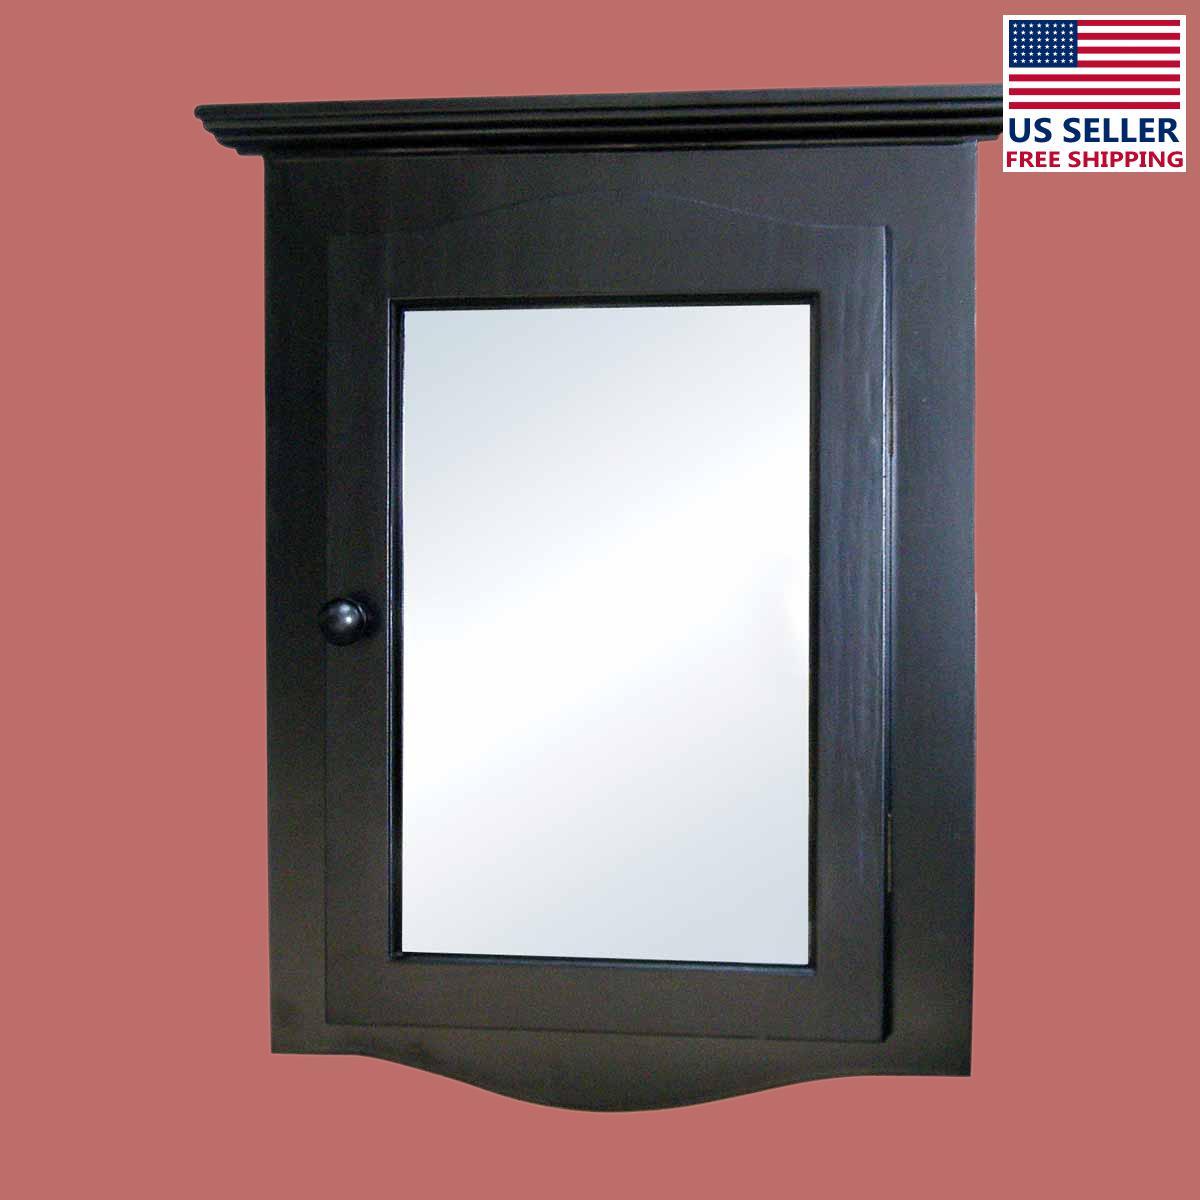 black solid wood corner medicine cabinet recessed mirror renovator 39 s supply ebay. Black Bedroom Furniture Sets. Home Design Ideas